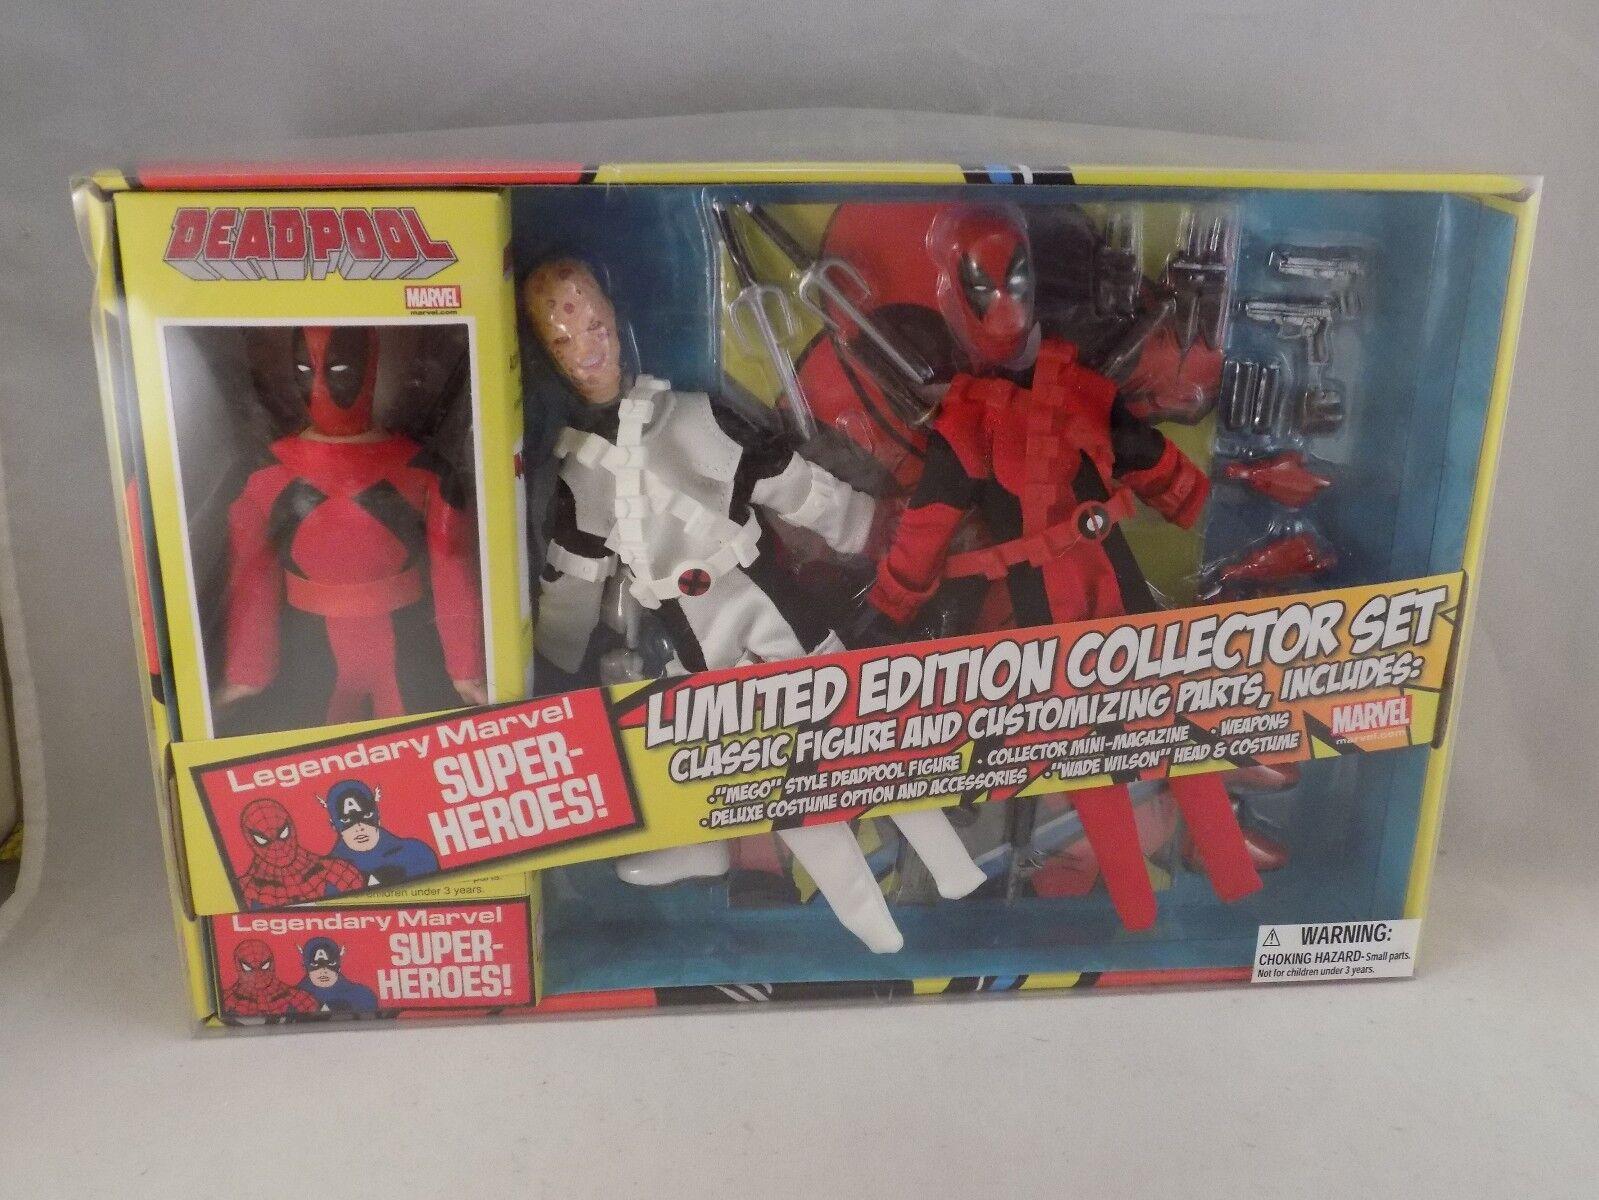 MARVEL DEADPOOL Limited Edition Collector Set Classic Figure MEGO Deadpool